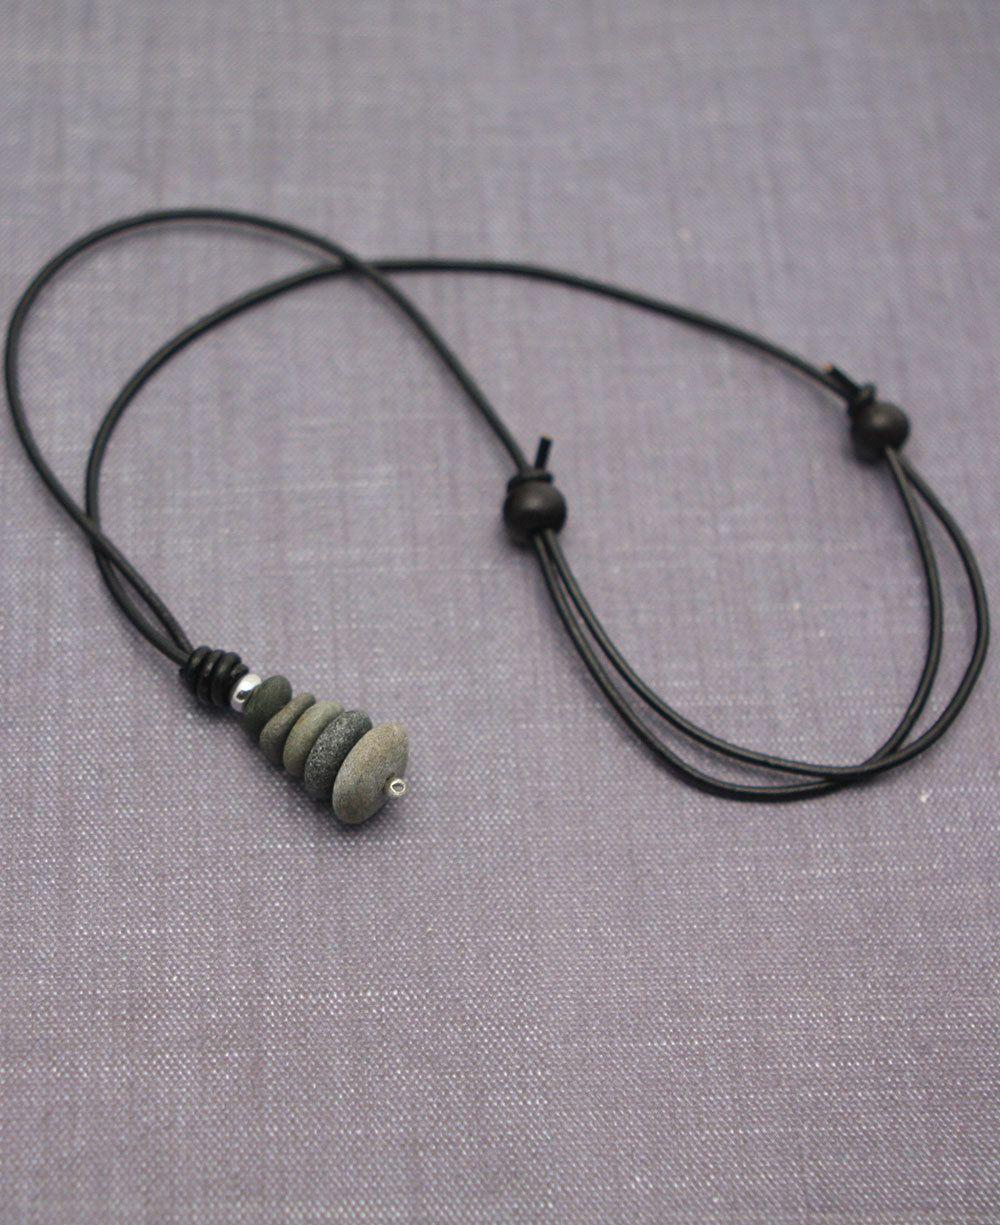 9e3c053f91de Zen stones pendant necklace available at Buddha Groove. Arte De Guijarros